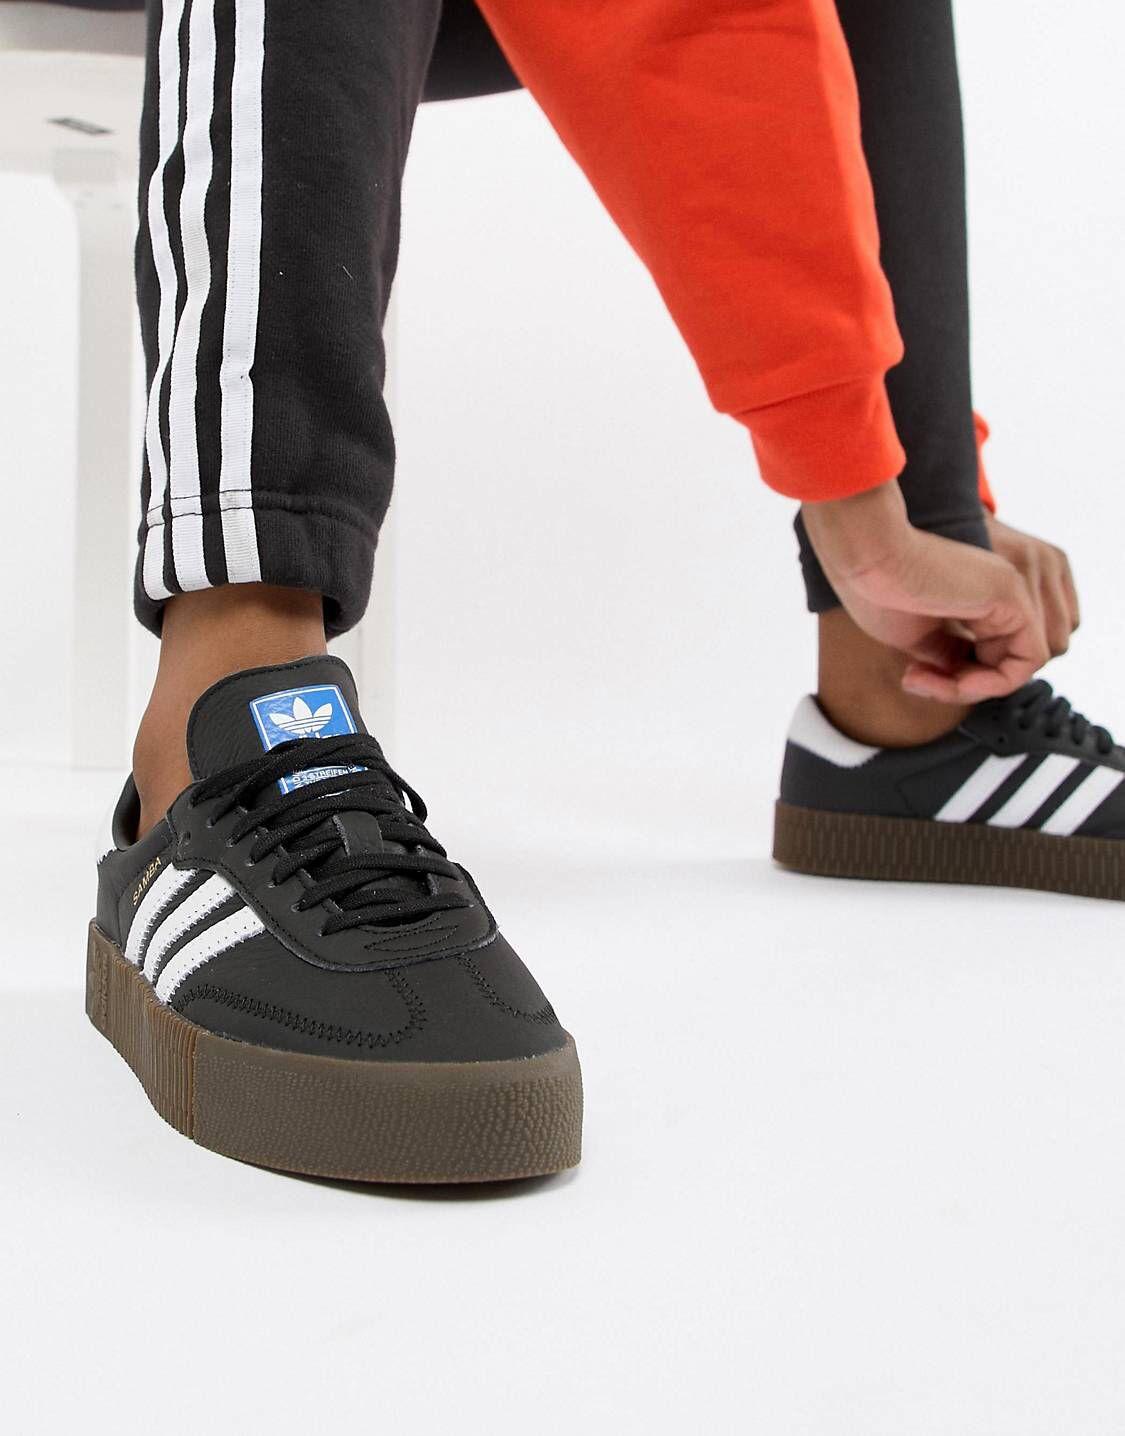 ebe13ce3a94 adidas Originals Samba Rose Sneakers In Black With Dark Gum Sole in ...